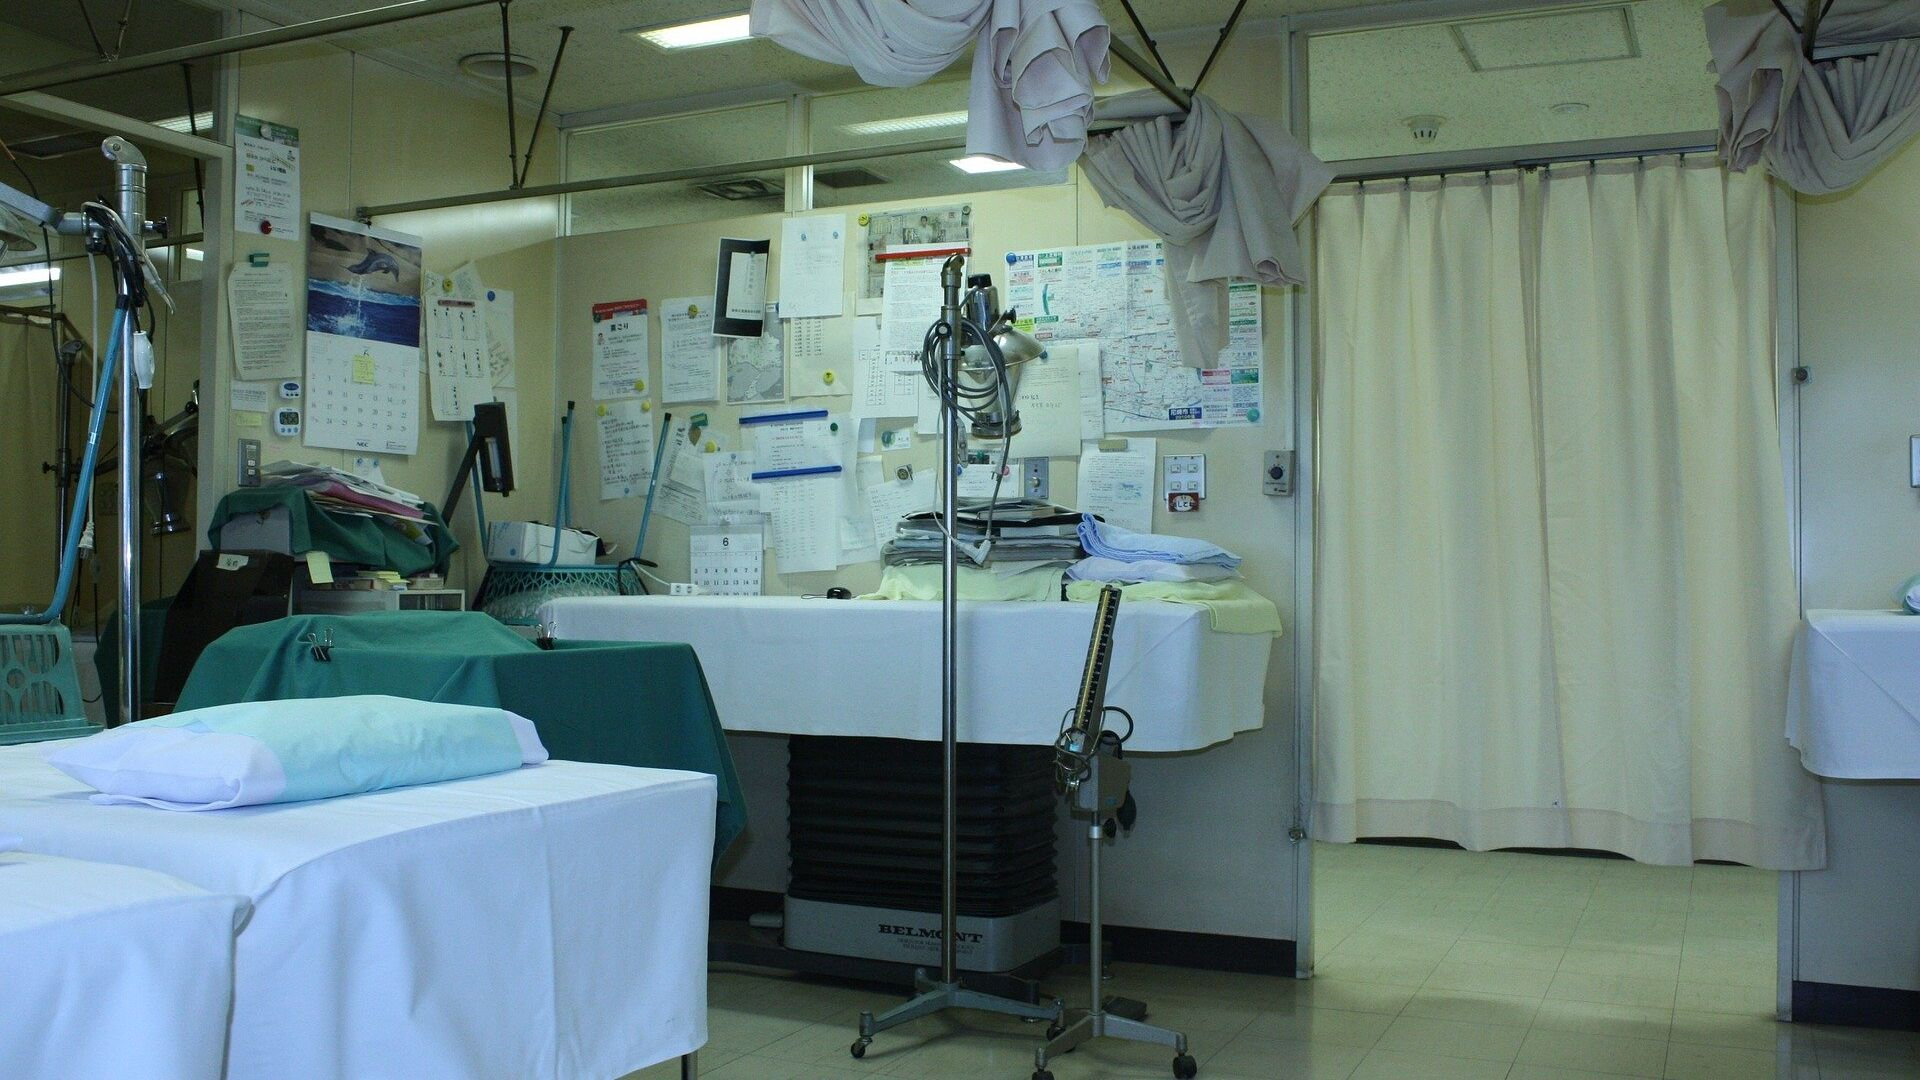 Hospital (imagen referencial) - Sputnik Mundo, 1920, 05.09.2021